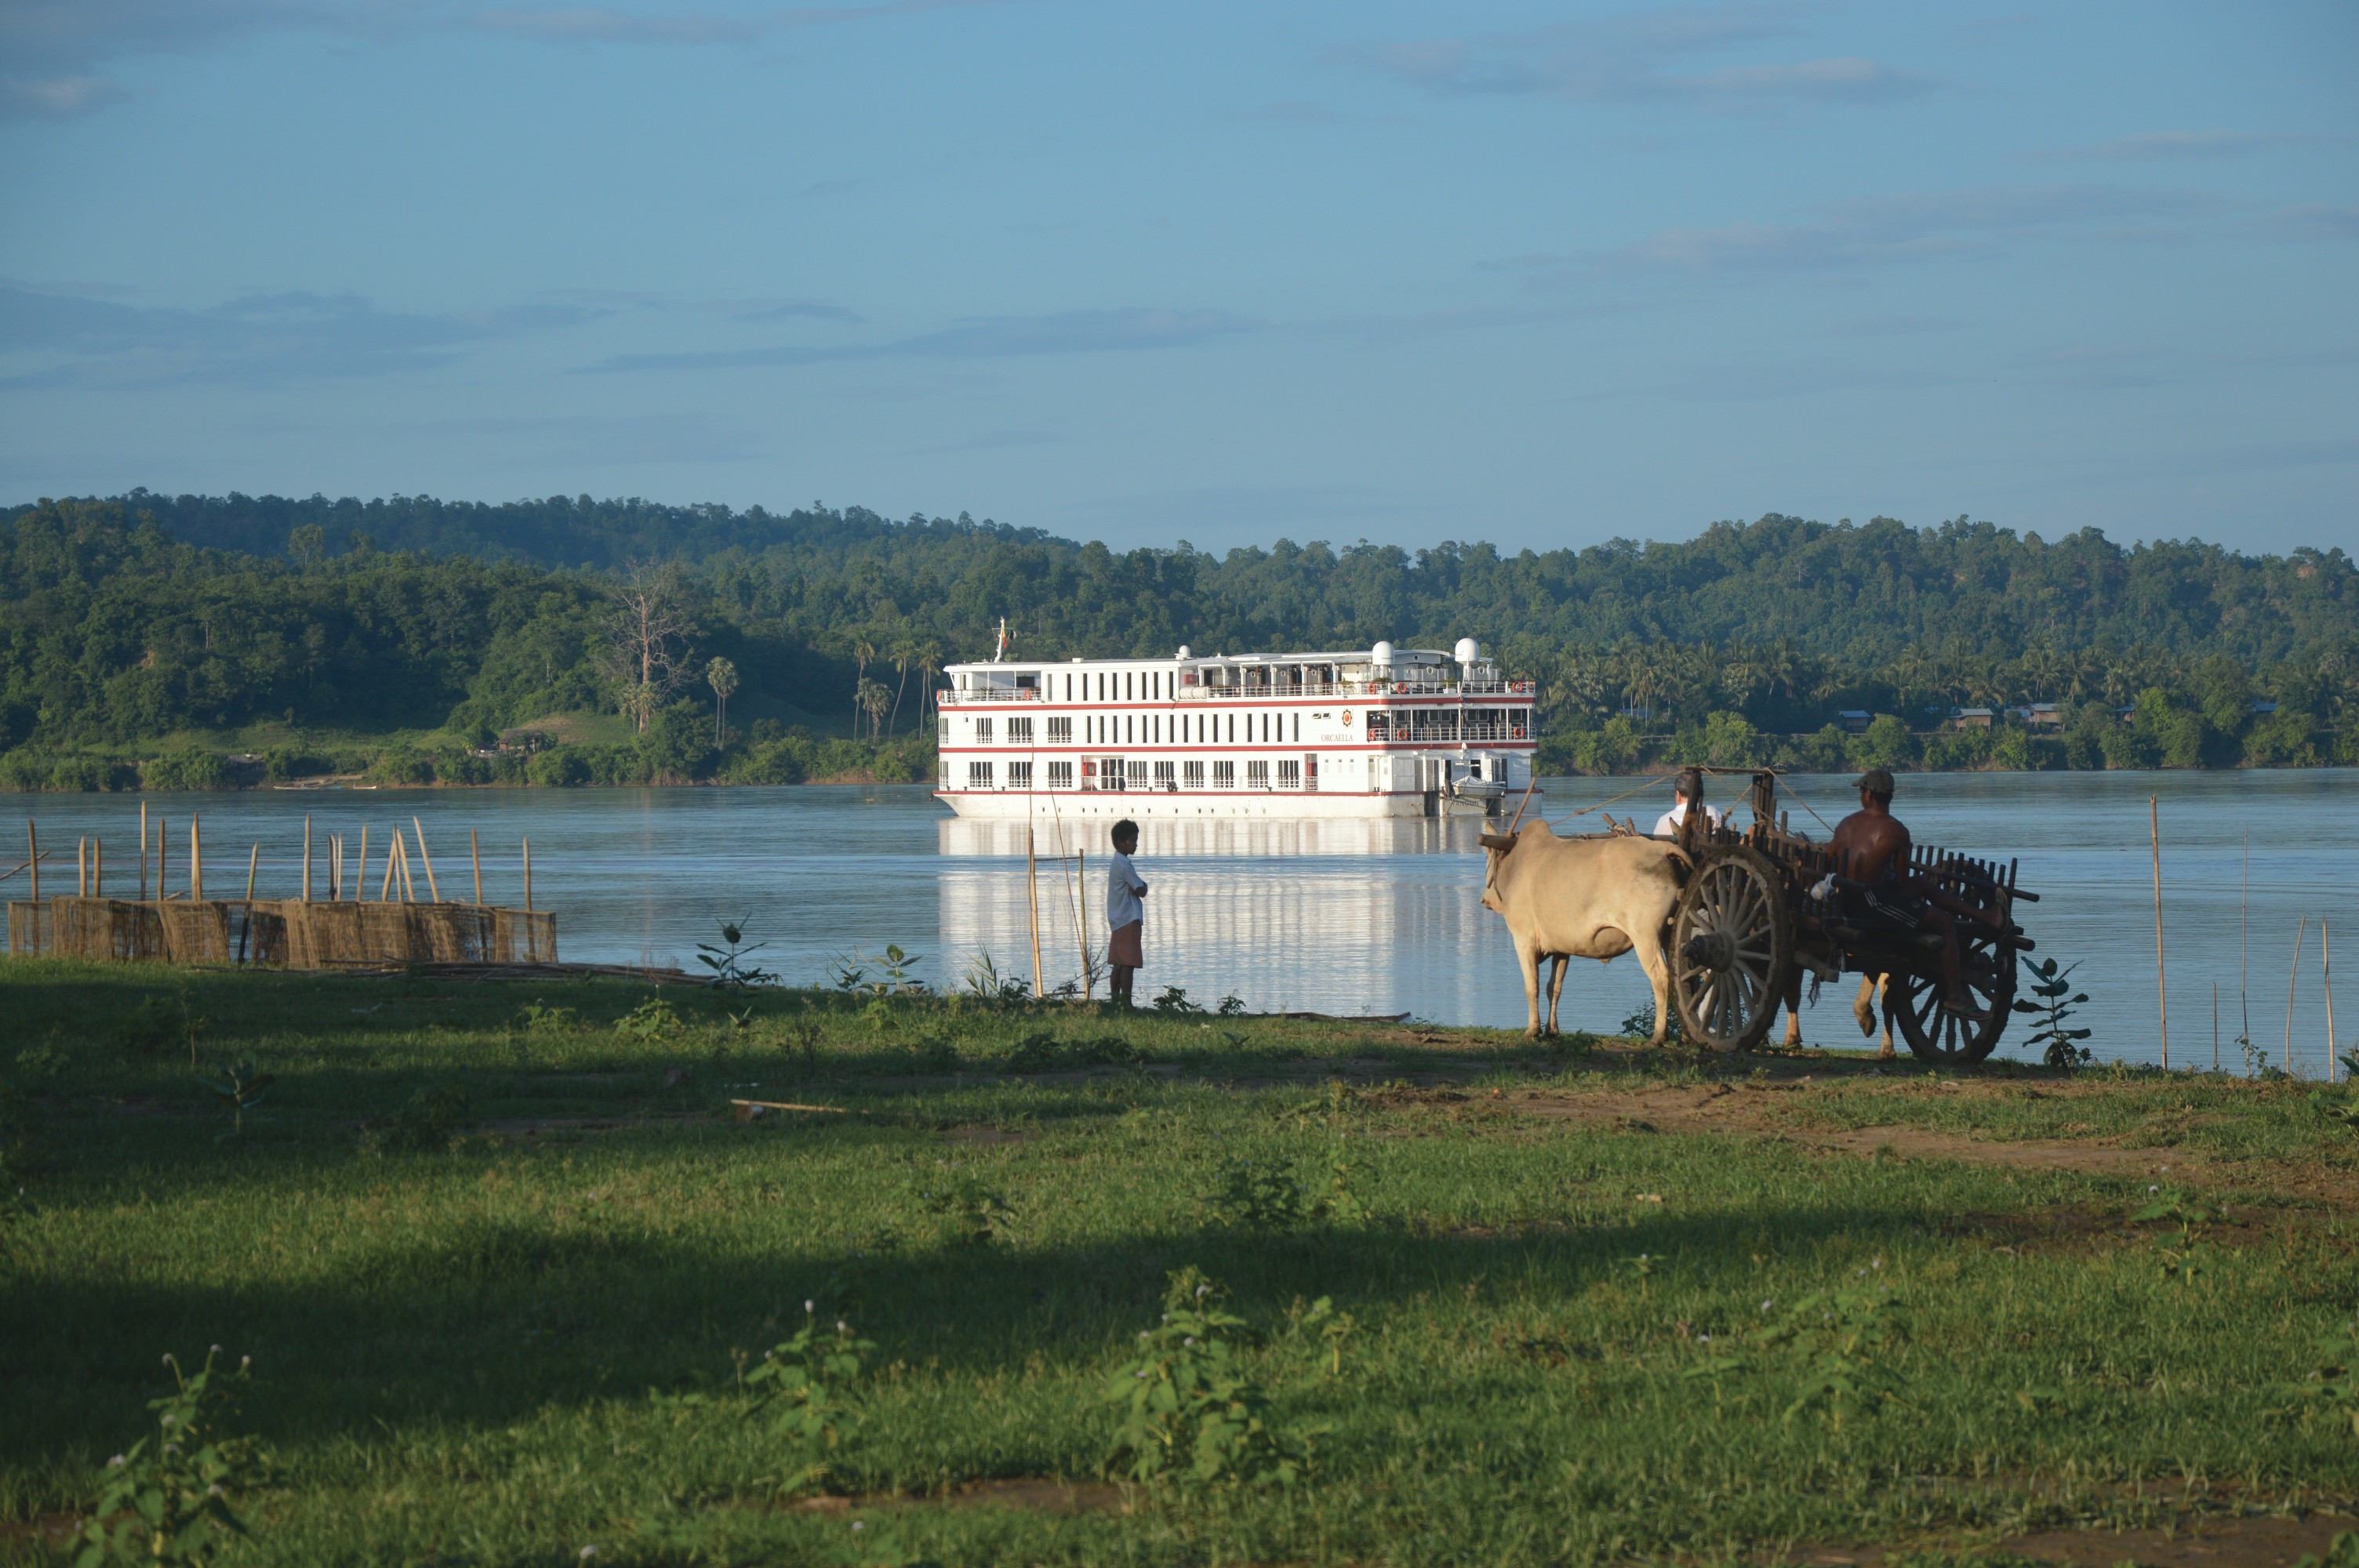 Belmond River Cruises Belmond Orcaella Exterior 9.jpg